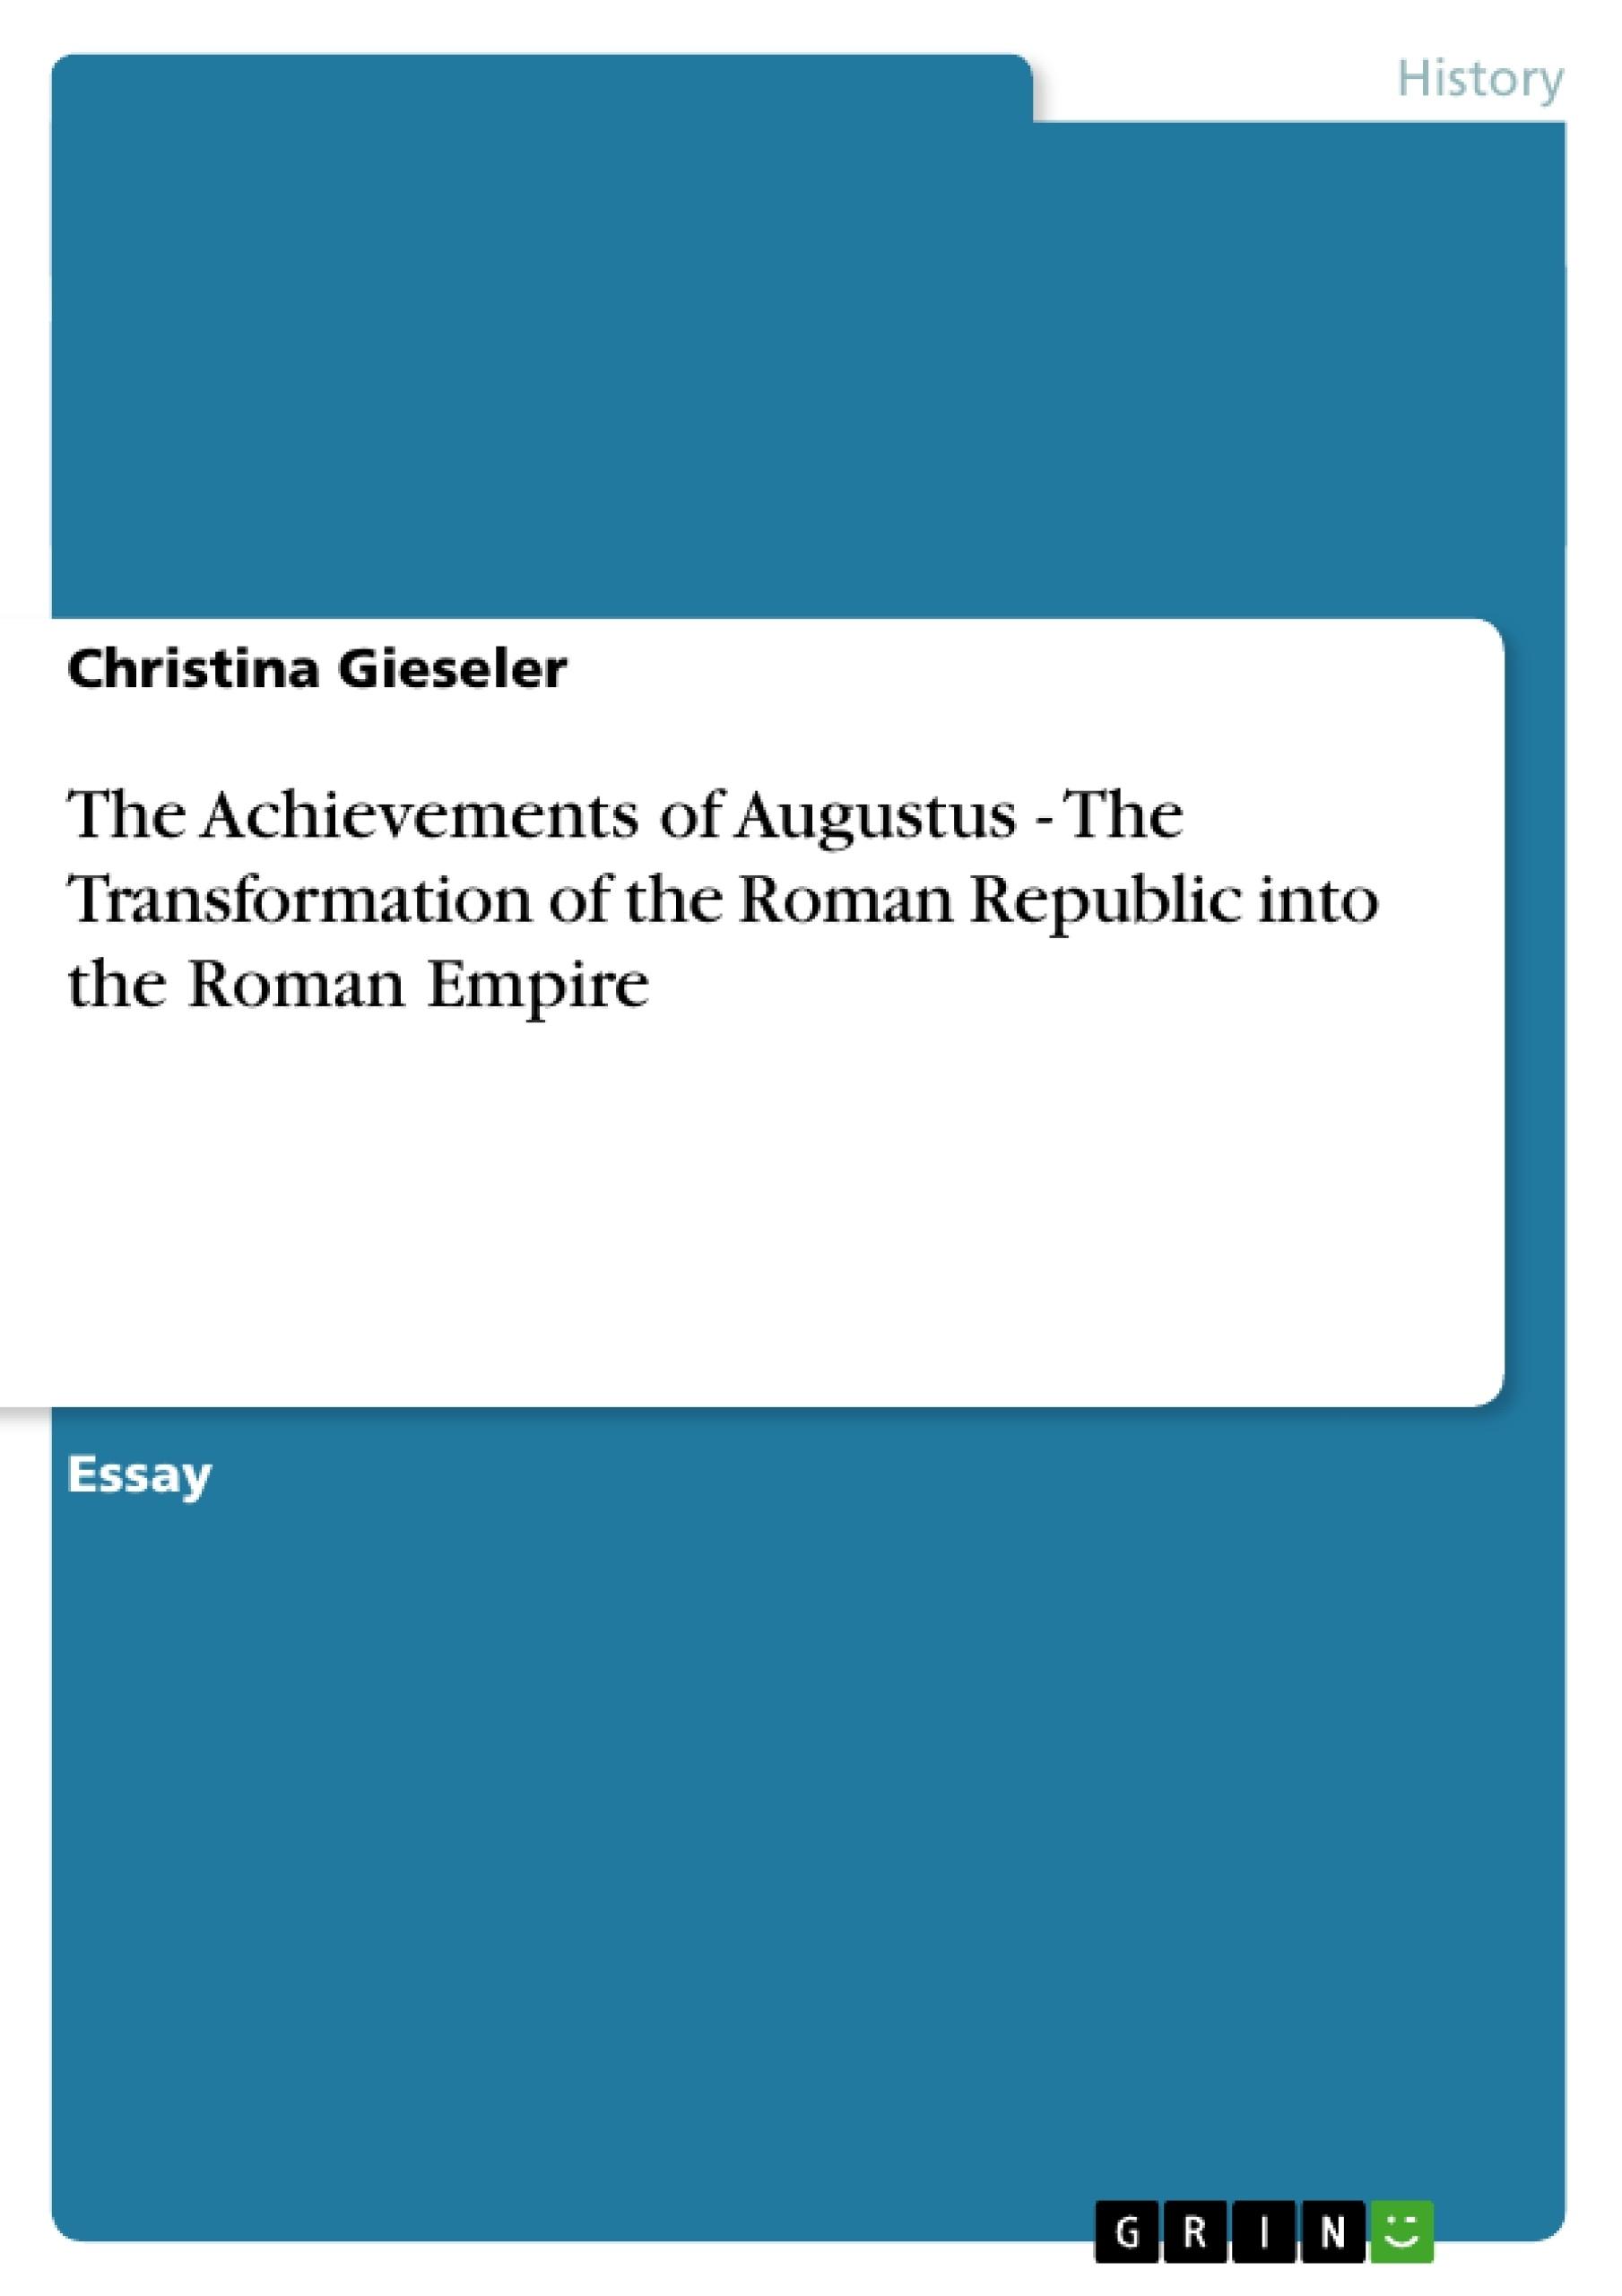 Title: The Achievements of Augustus - The Transformation of the Roman Republic into the Roman Empire